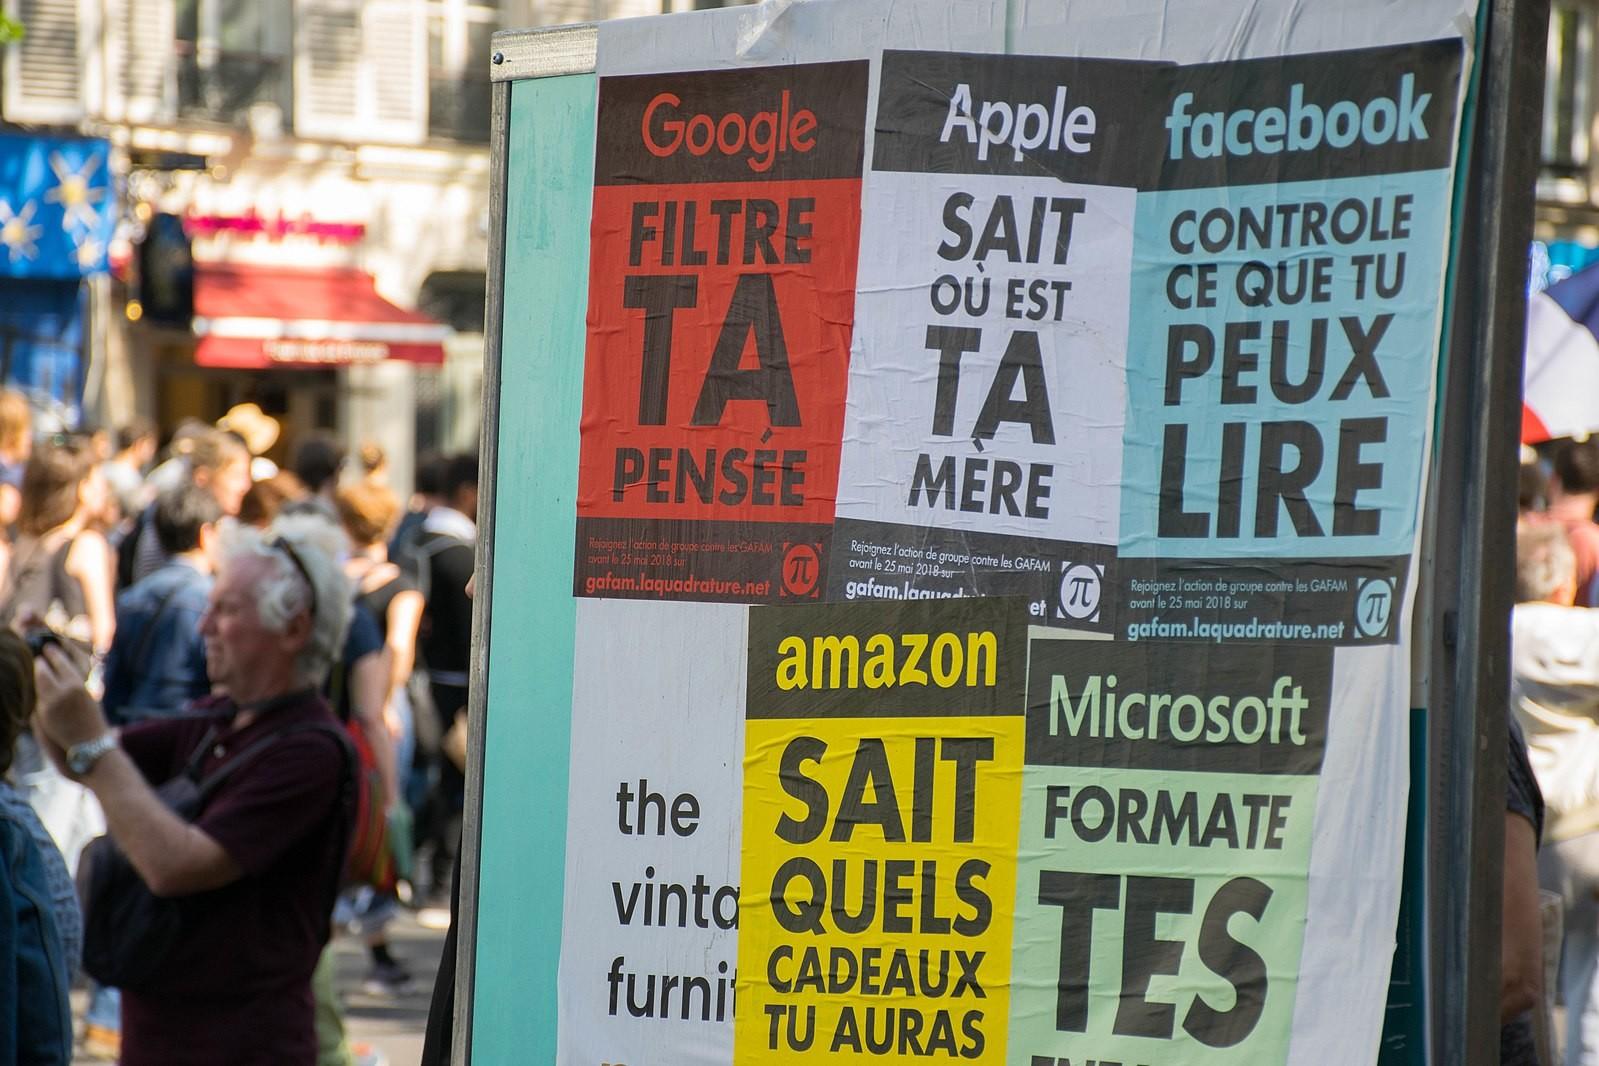 alternativas éticas a los gigantes tecnológicos